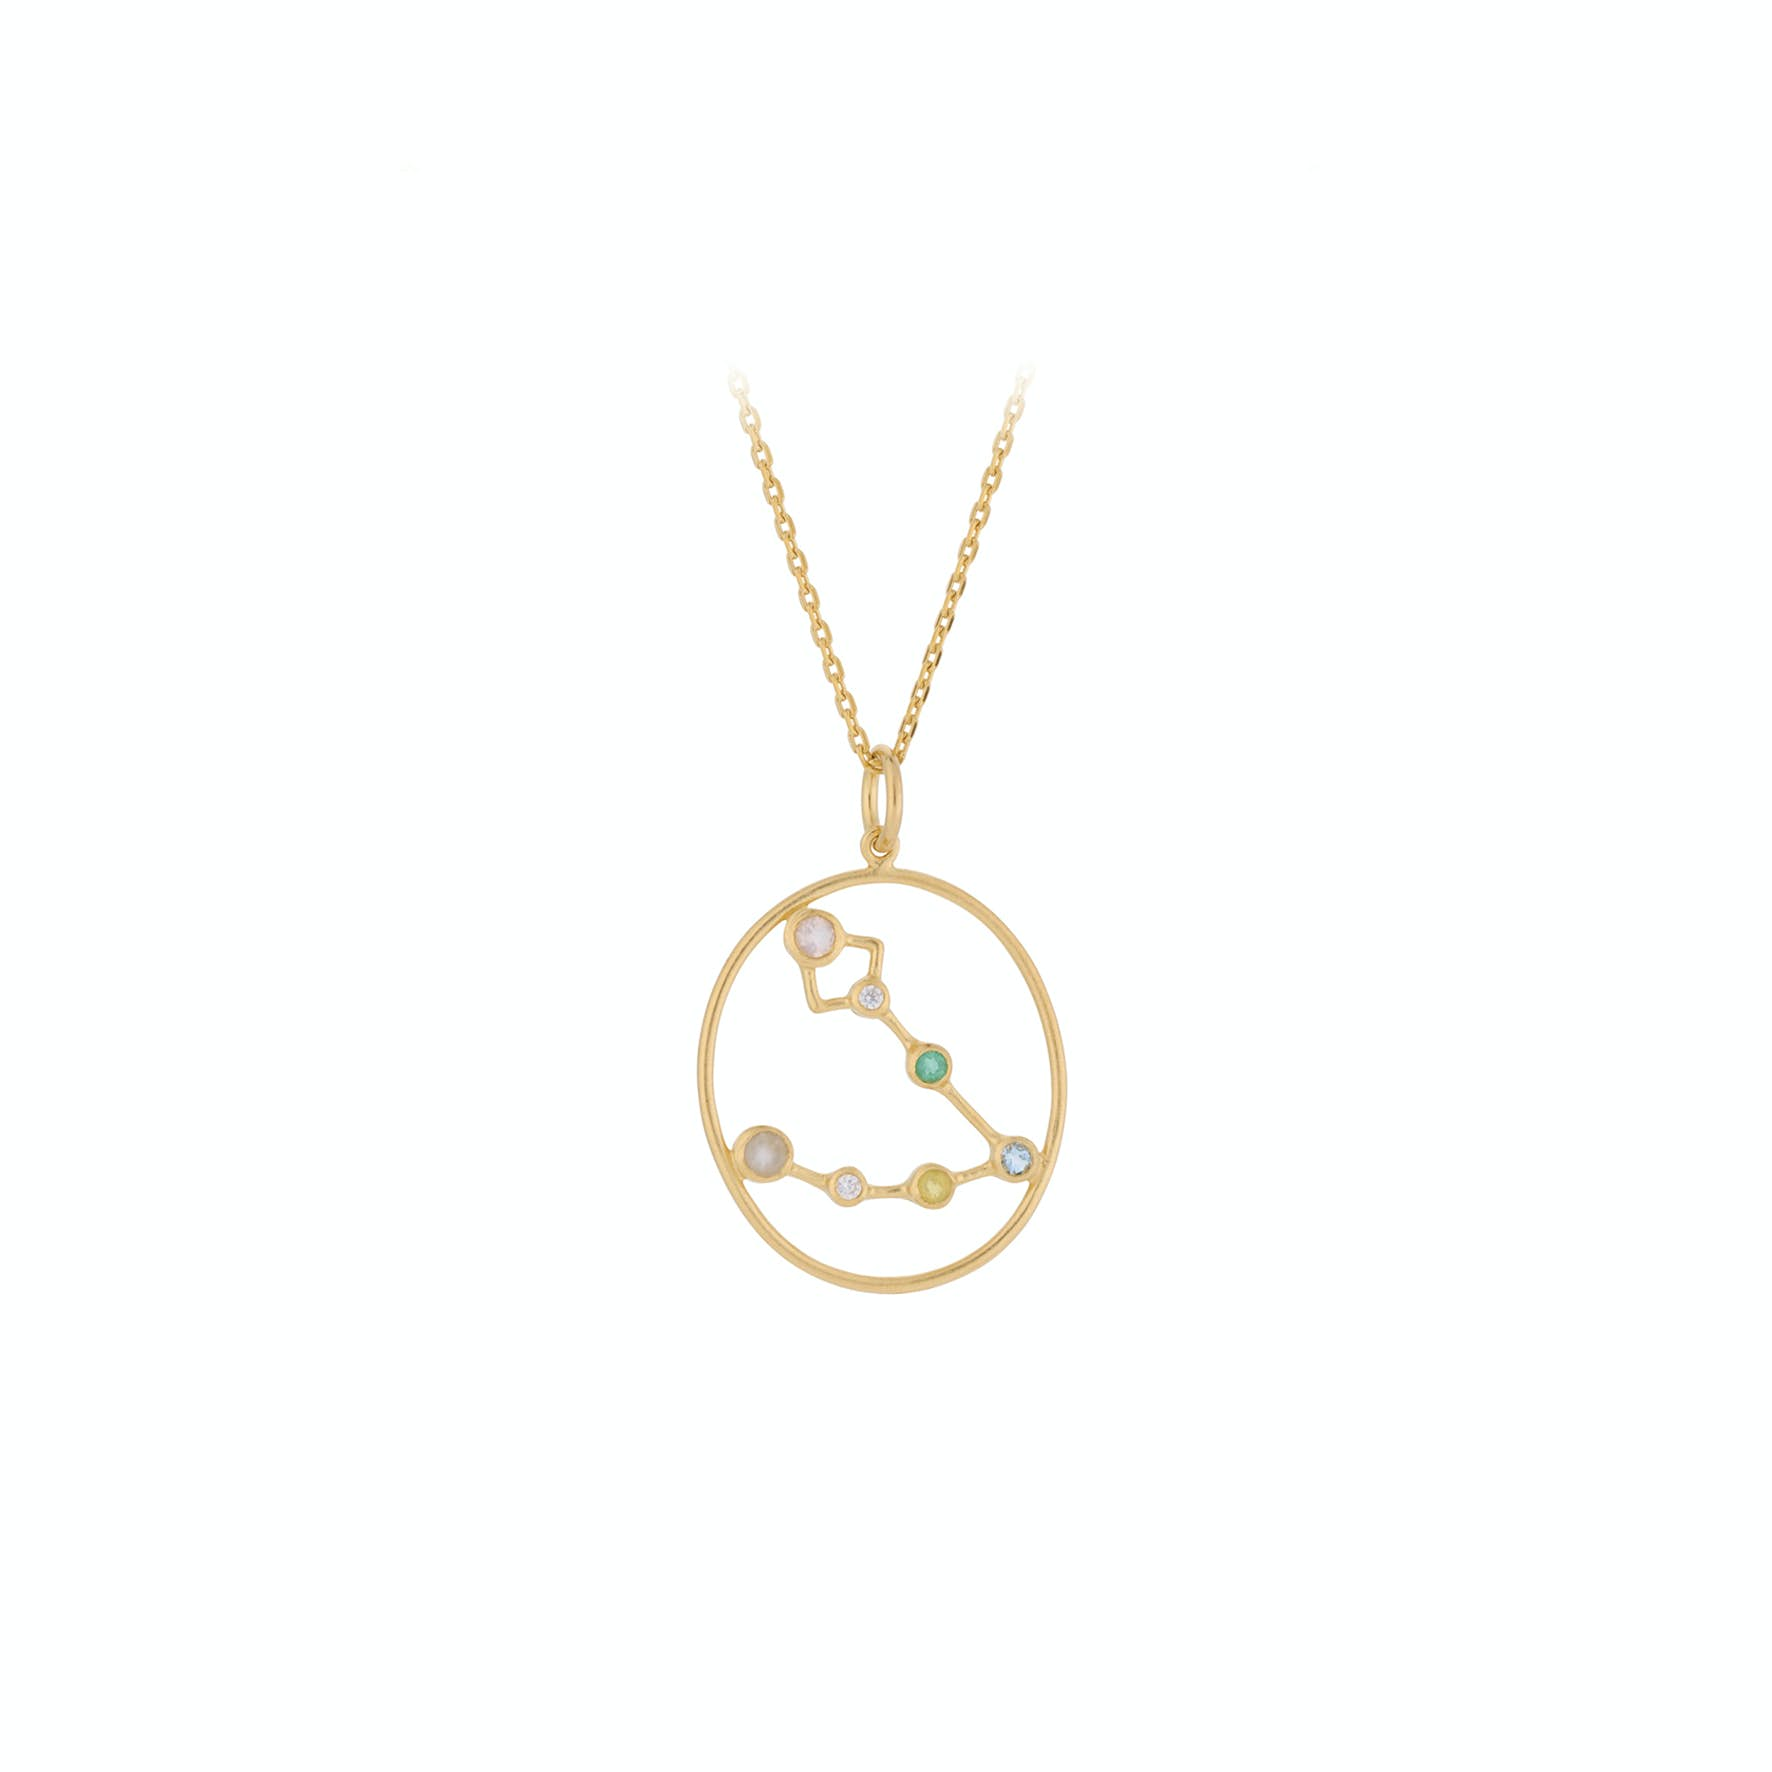 Zodiac Pisces Necklace (Feb 19 - Mar 20) von Pernille Corydon in Vergoldet-Silber Sterling 925